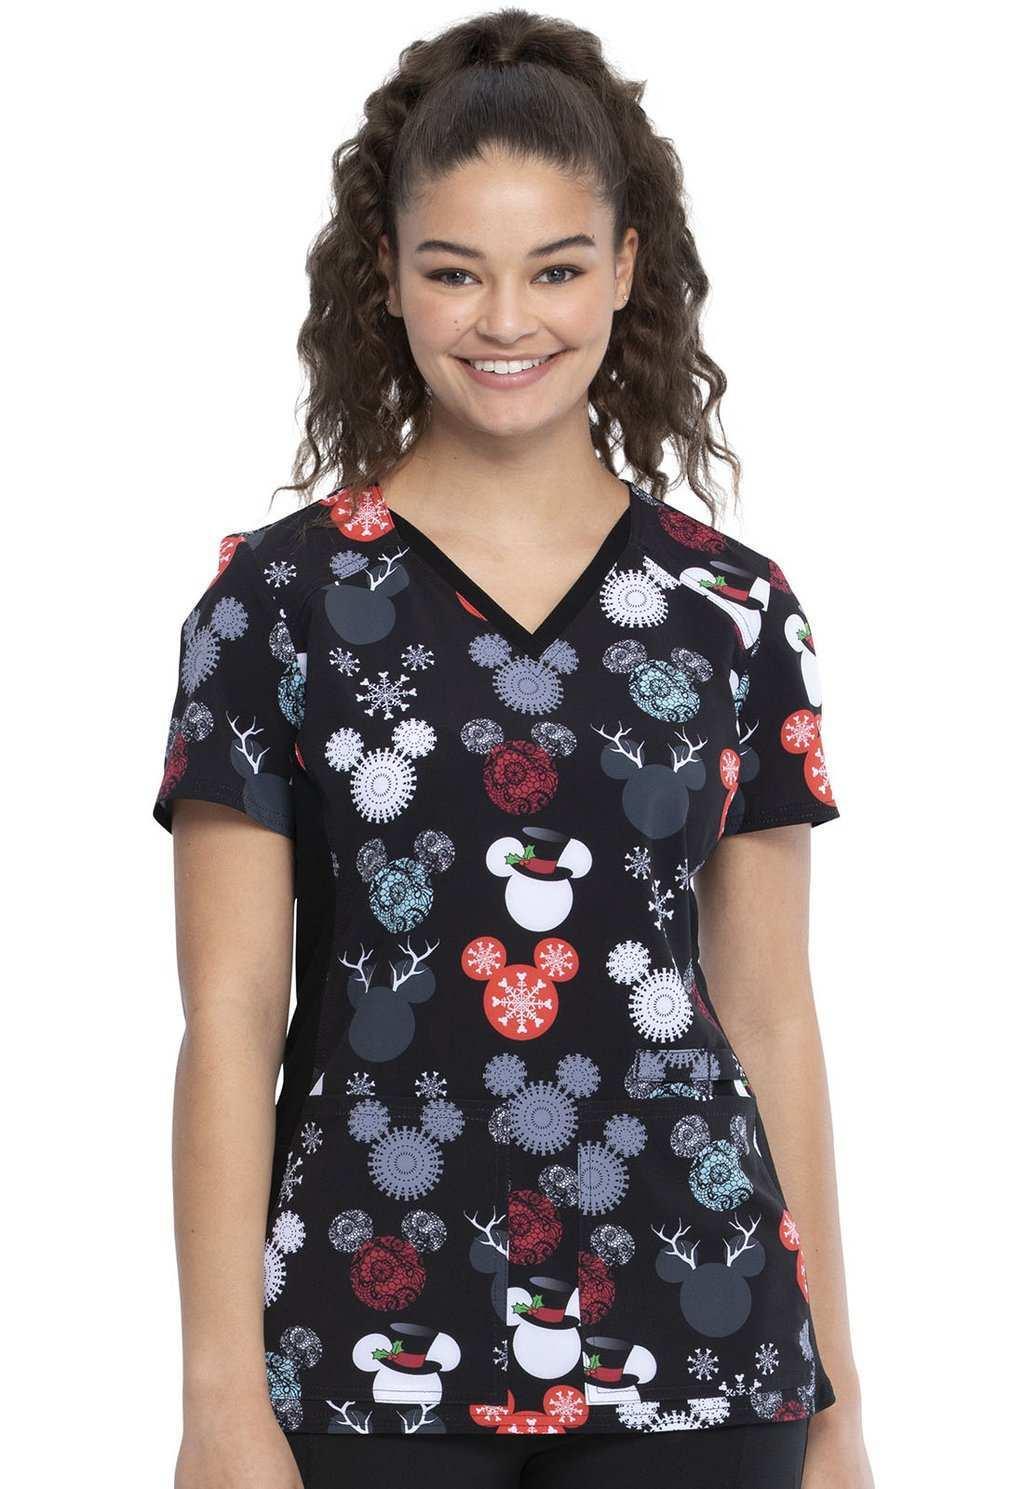 Damen Kasack Dickies Cherokee Mickey Minnie Disney Blaumann Co